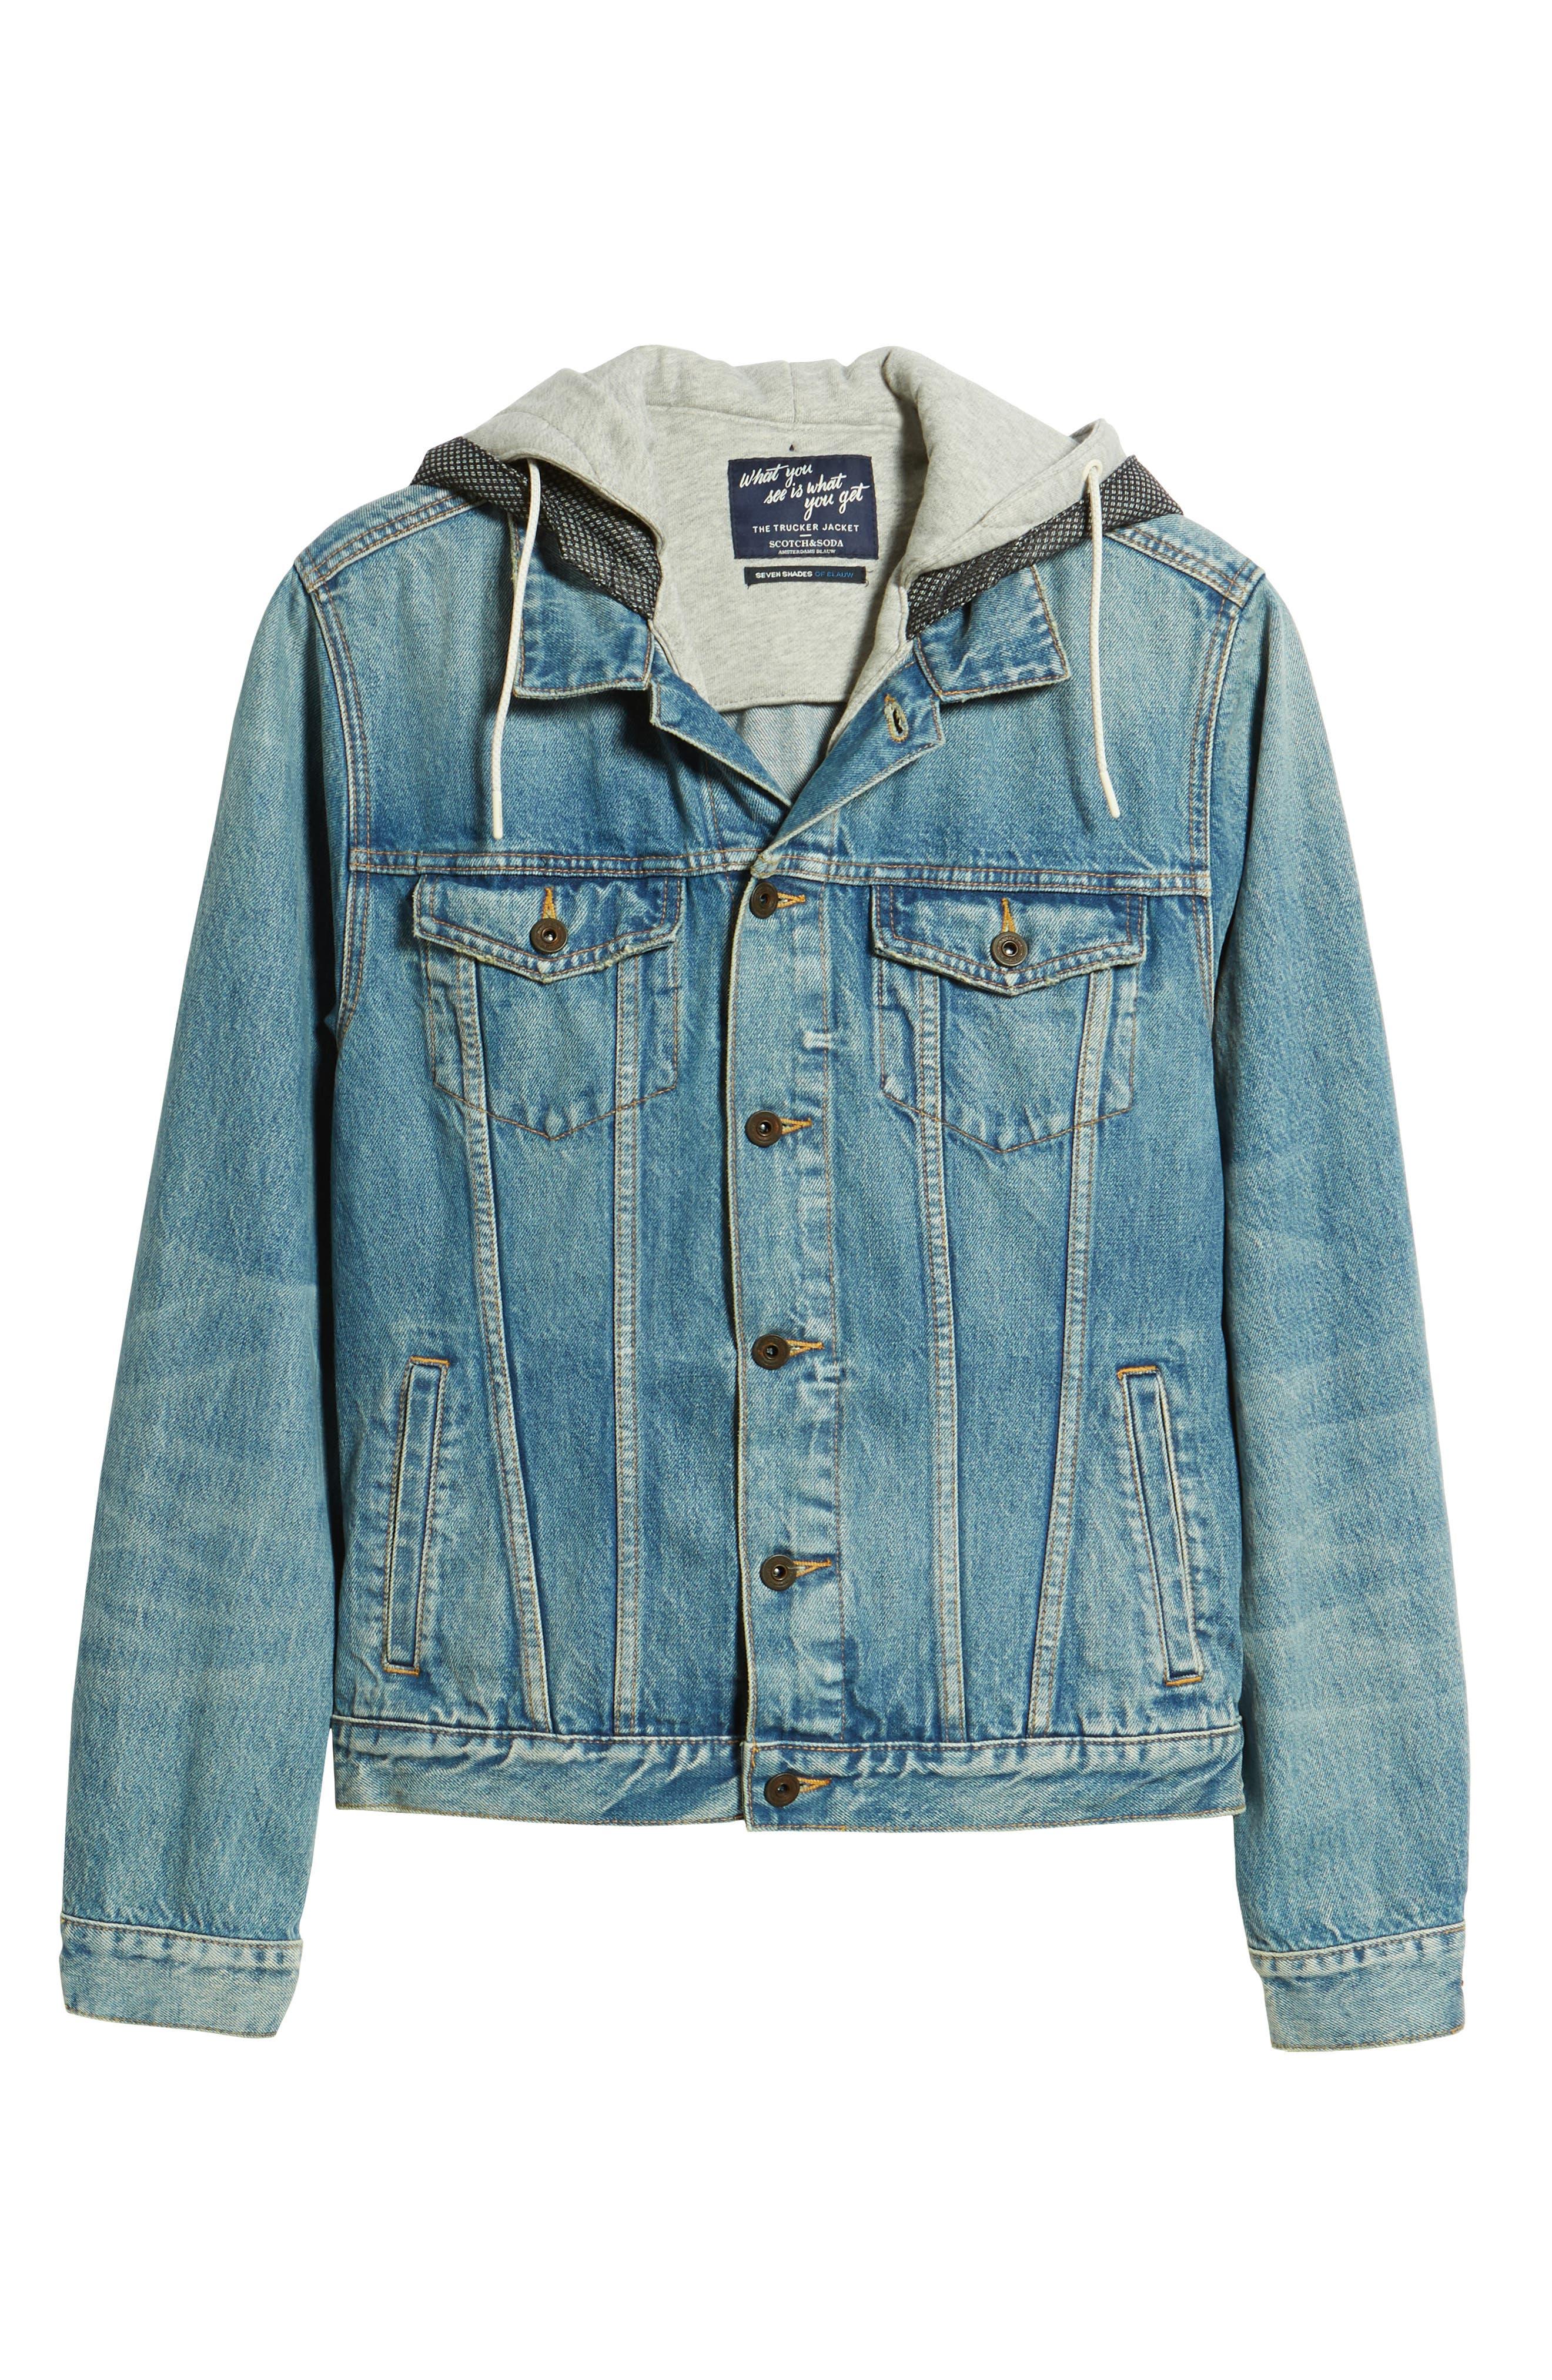 Amsterdam Blauw Hooded Trucker Jacket,                             Alternate thumbnail 6, color,                             410